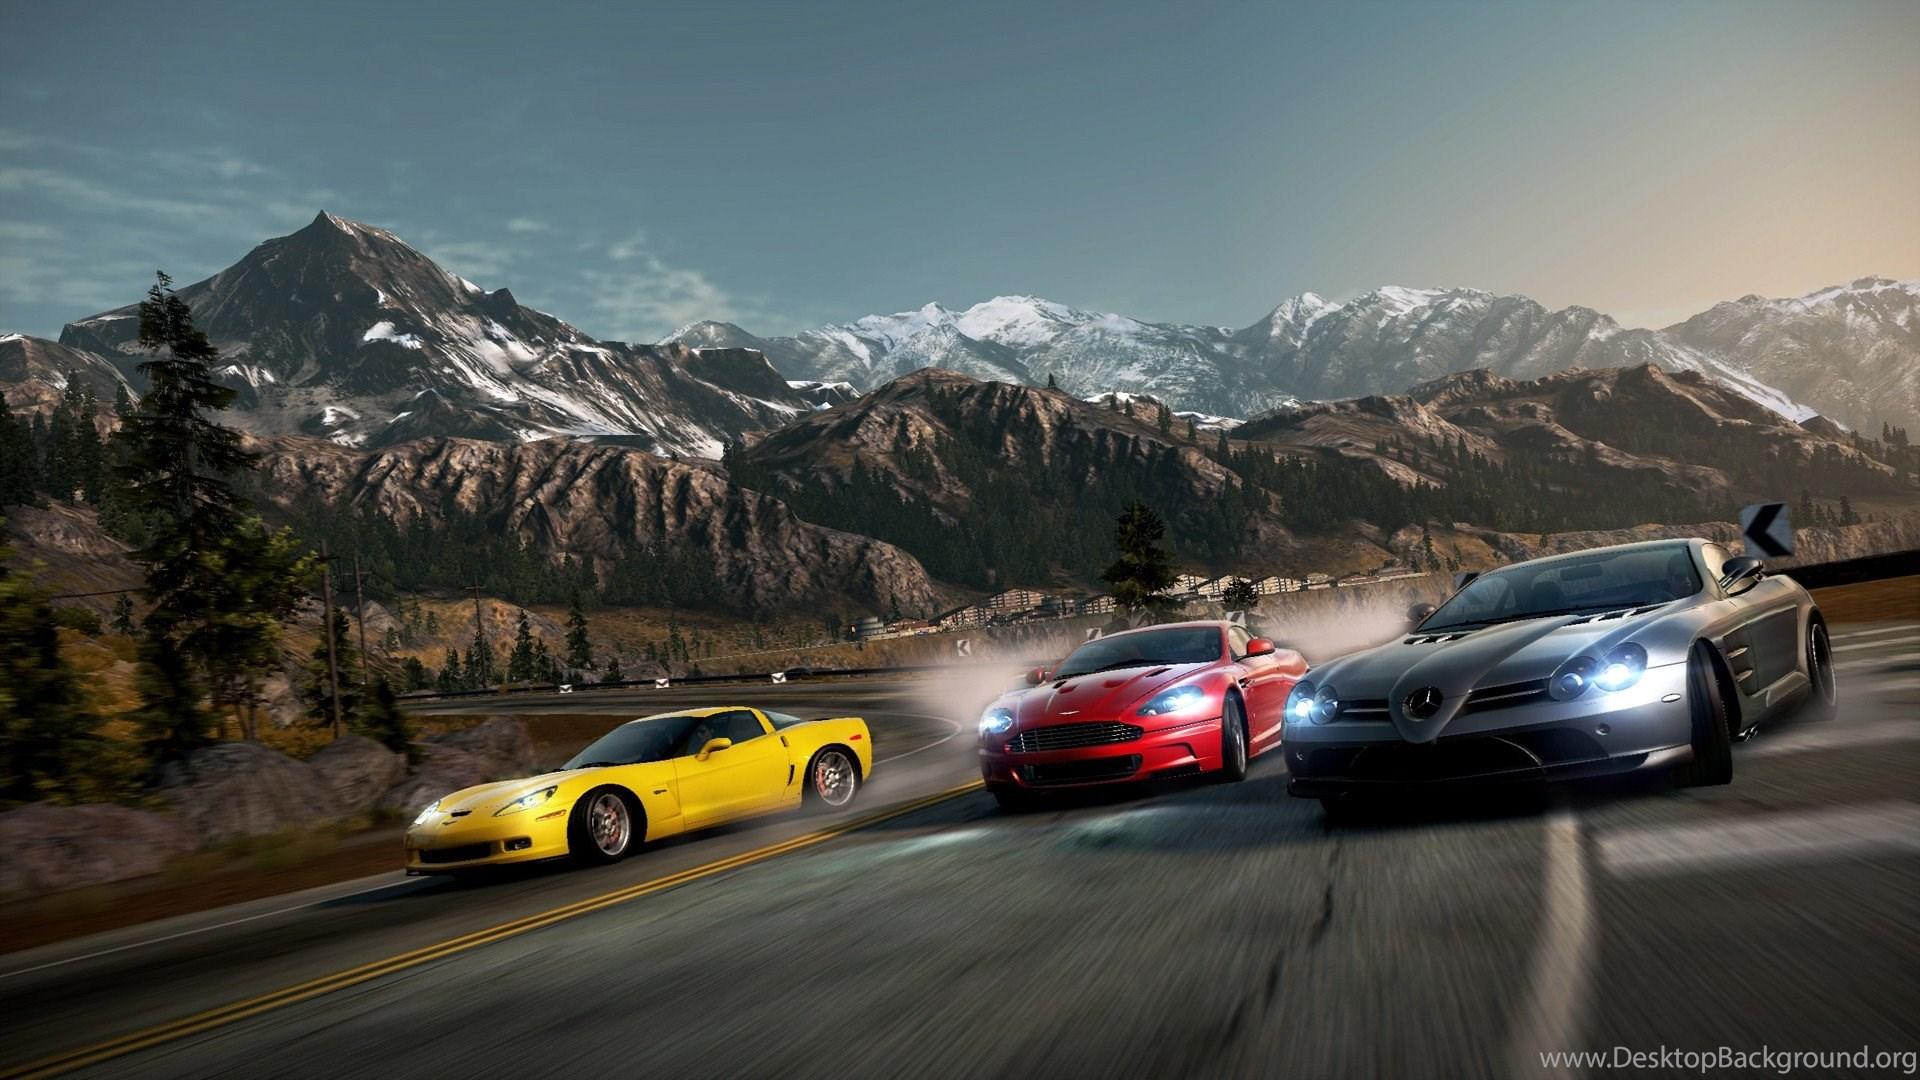 Need For Speed Hot Pursuit Wallpaper 11 Jpg Desktop Background